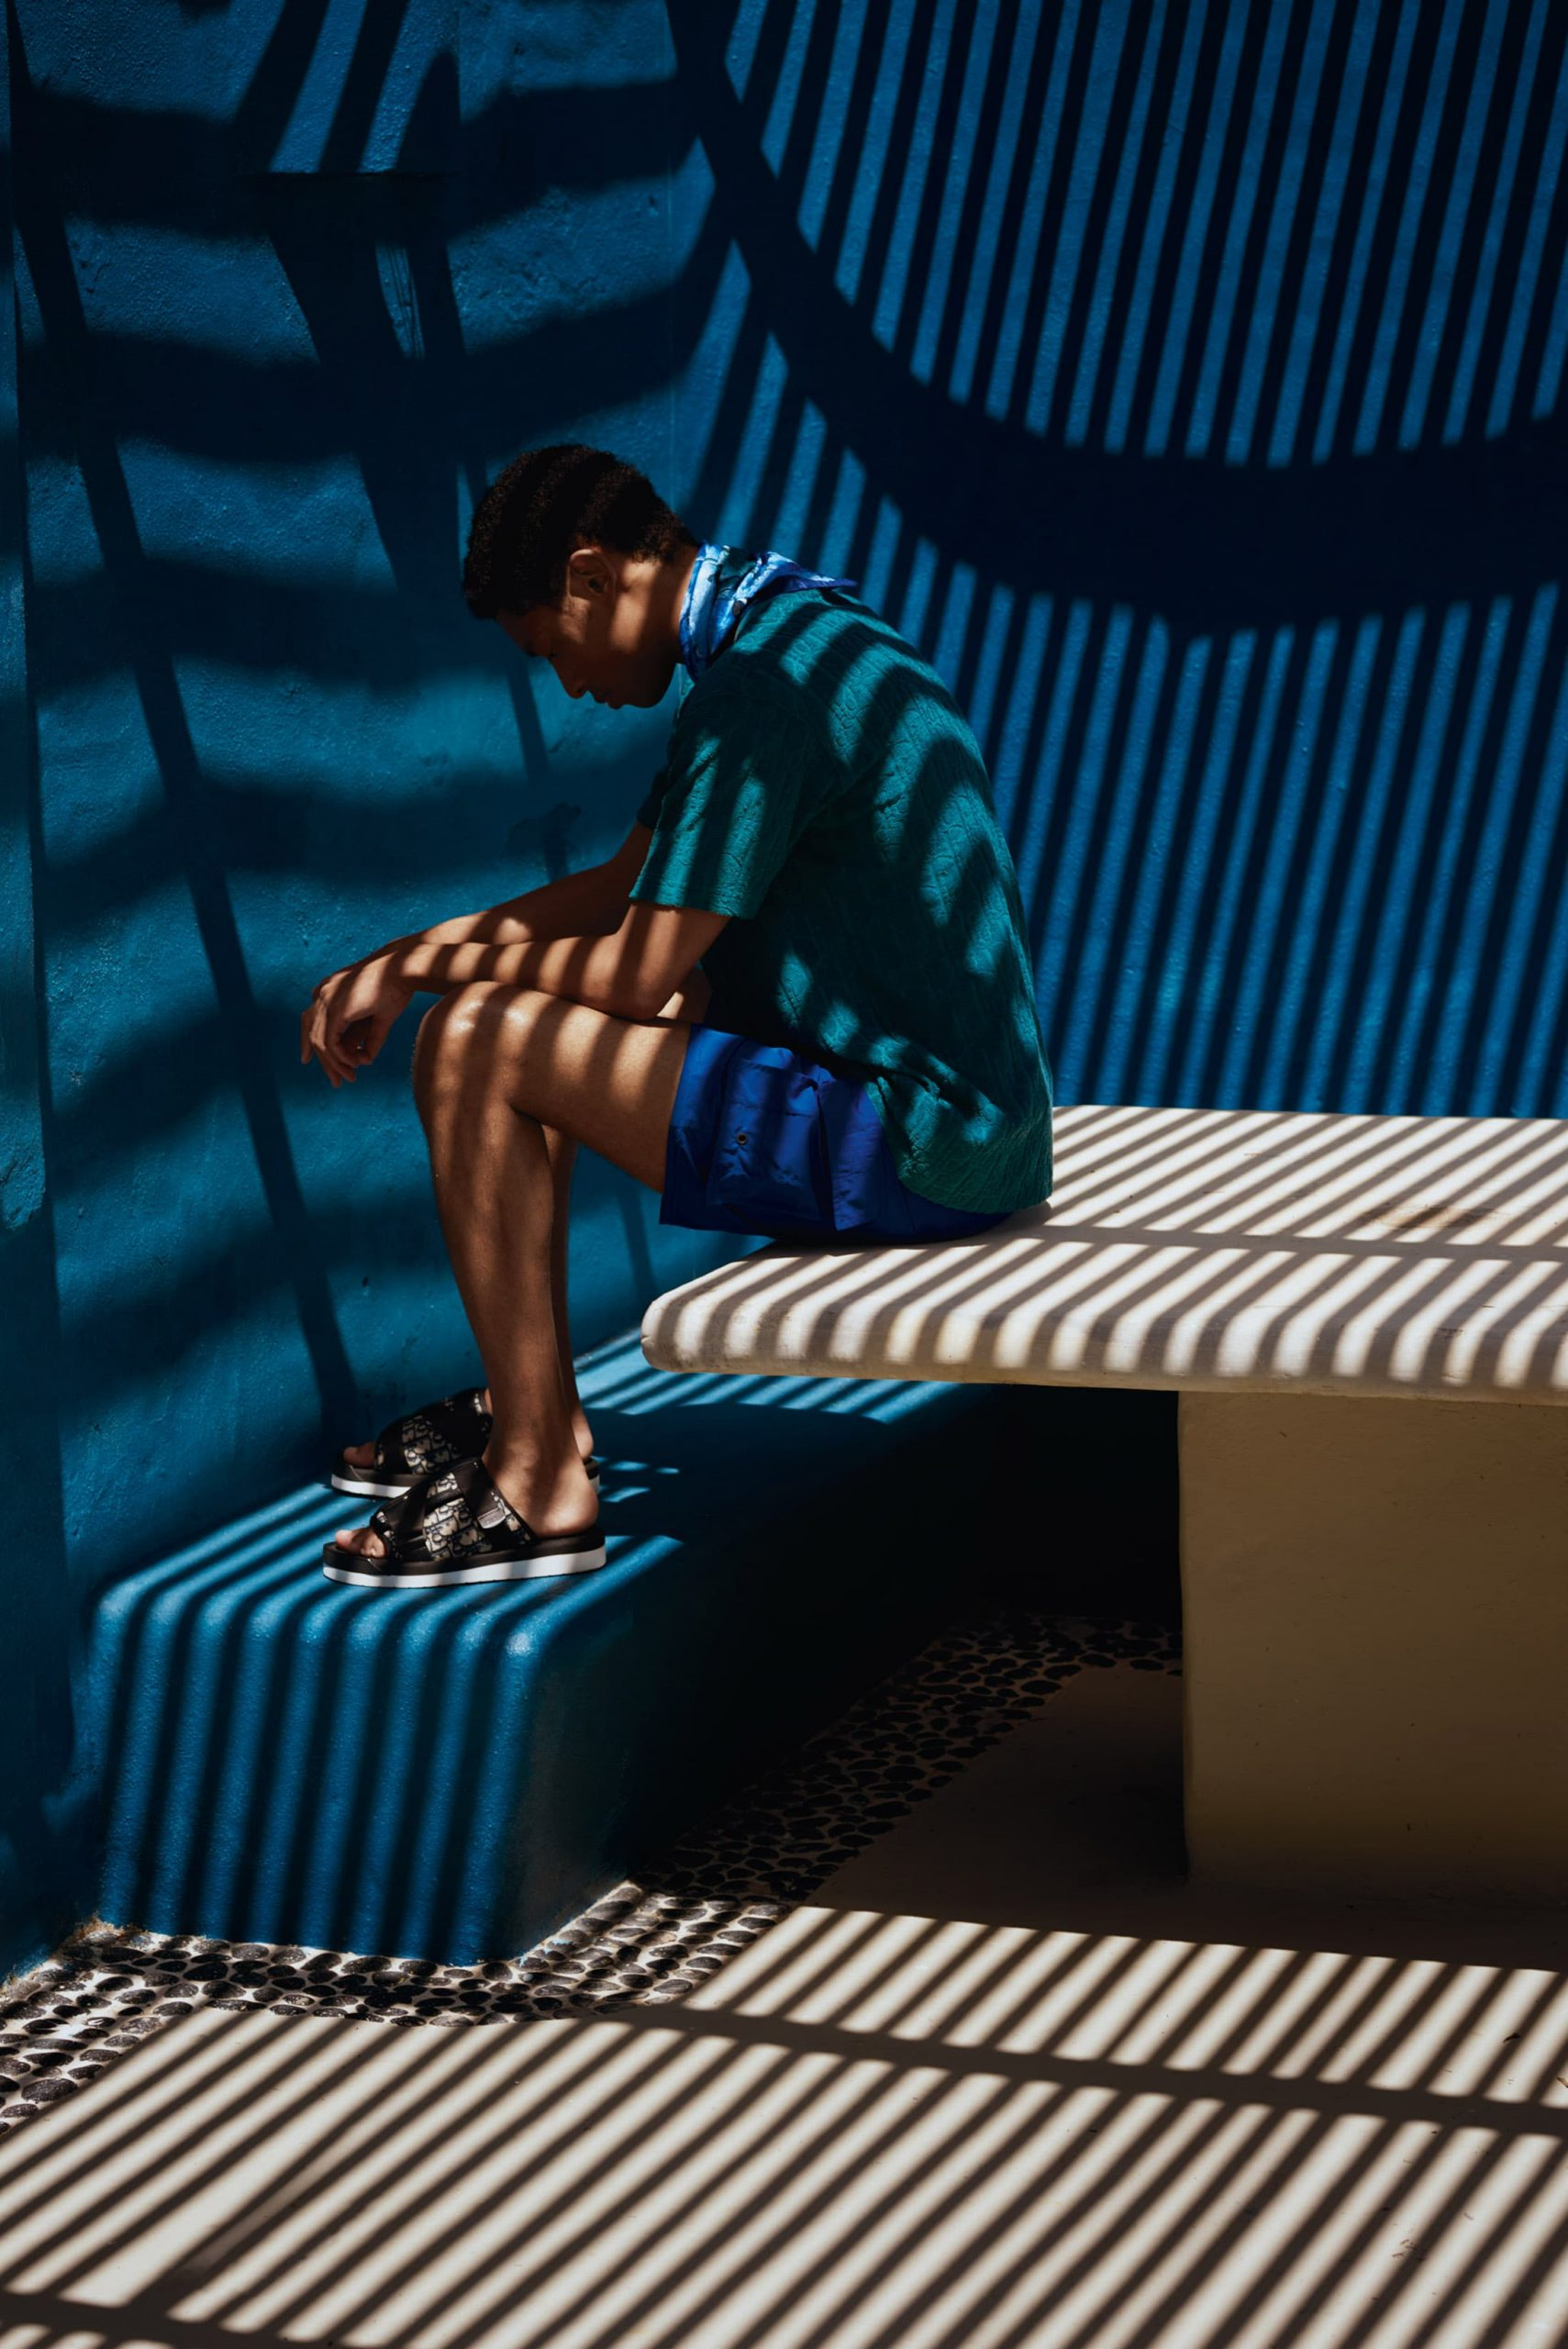 Dior Men's Summer 2021 Ad Campaign Photos